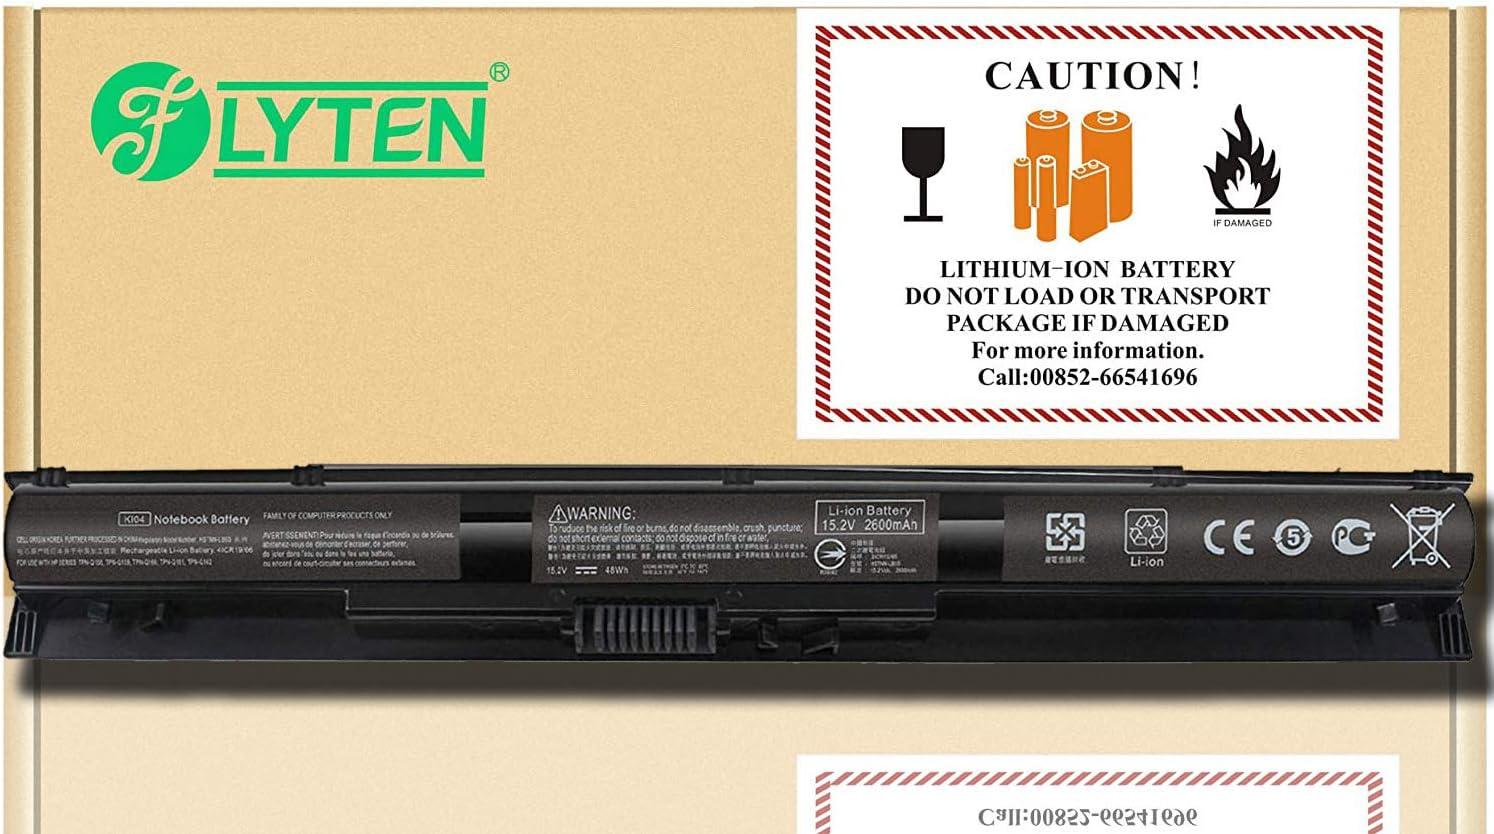 FLYTEN KI04 Battery for HP Pavilion 14-ab 15-ab 15-an 17-g Series 800009-421 800010-421 800049-001 800050-001 HSTNN-LB6S HSTNN-LB6R HSTNN-DB6T TPN-Q158 TPN-Q159 Notebook